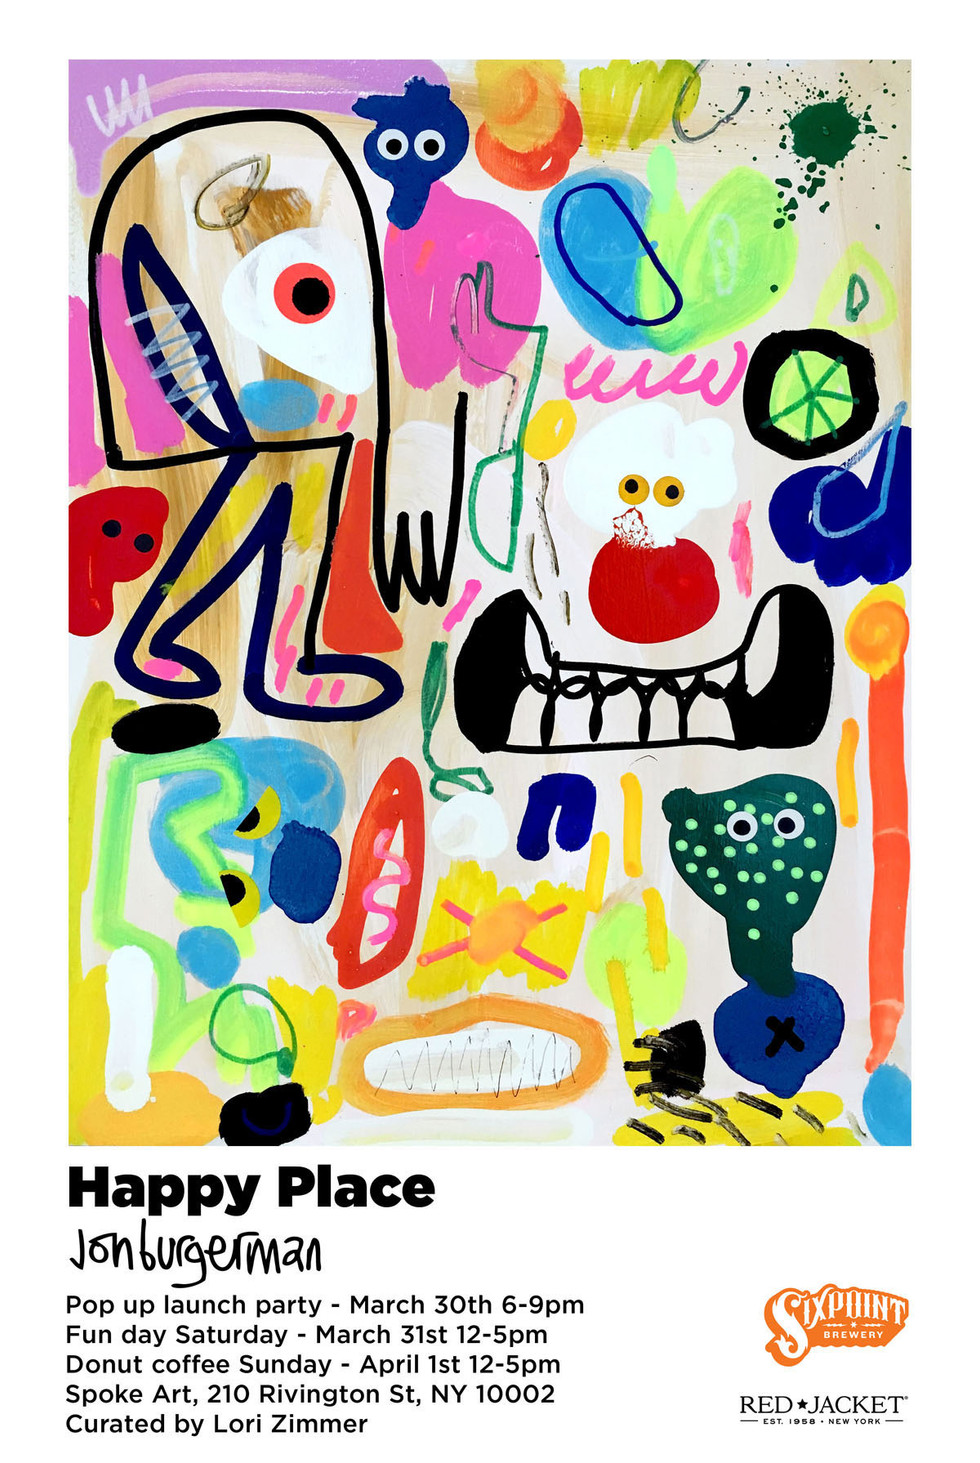 happy-place-jon-burgerman01jpg